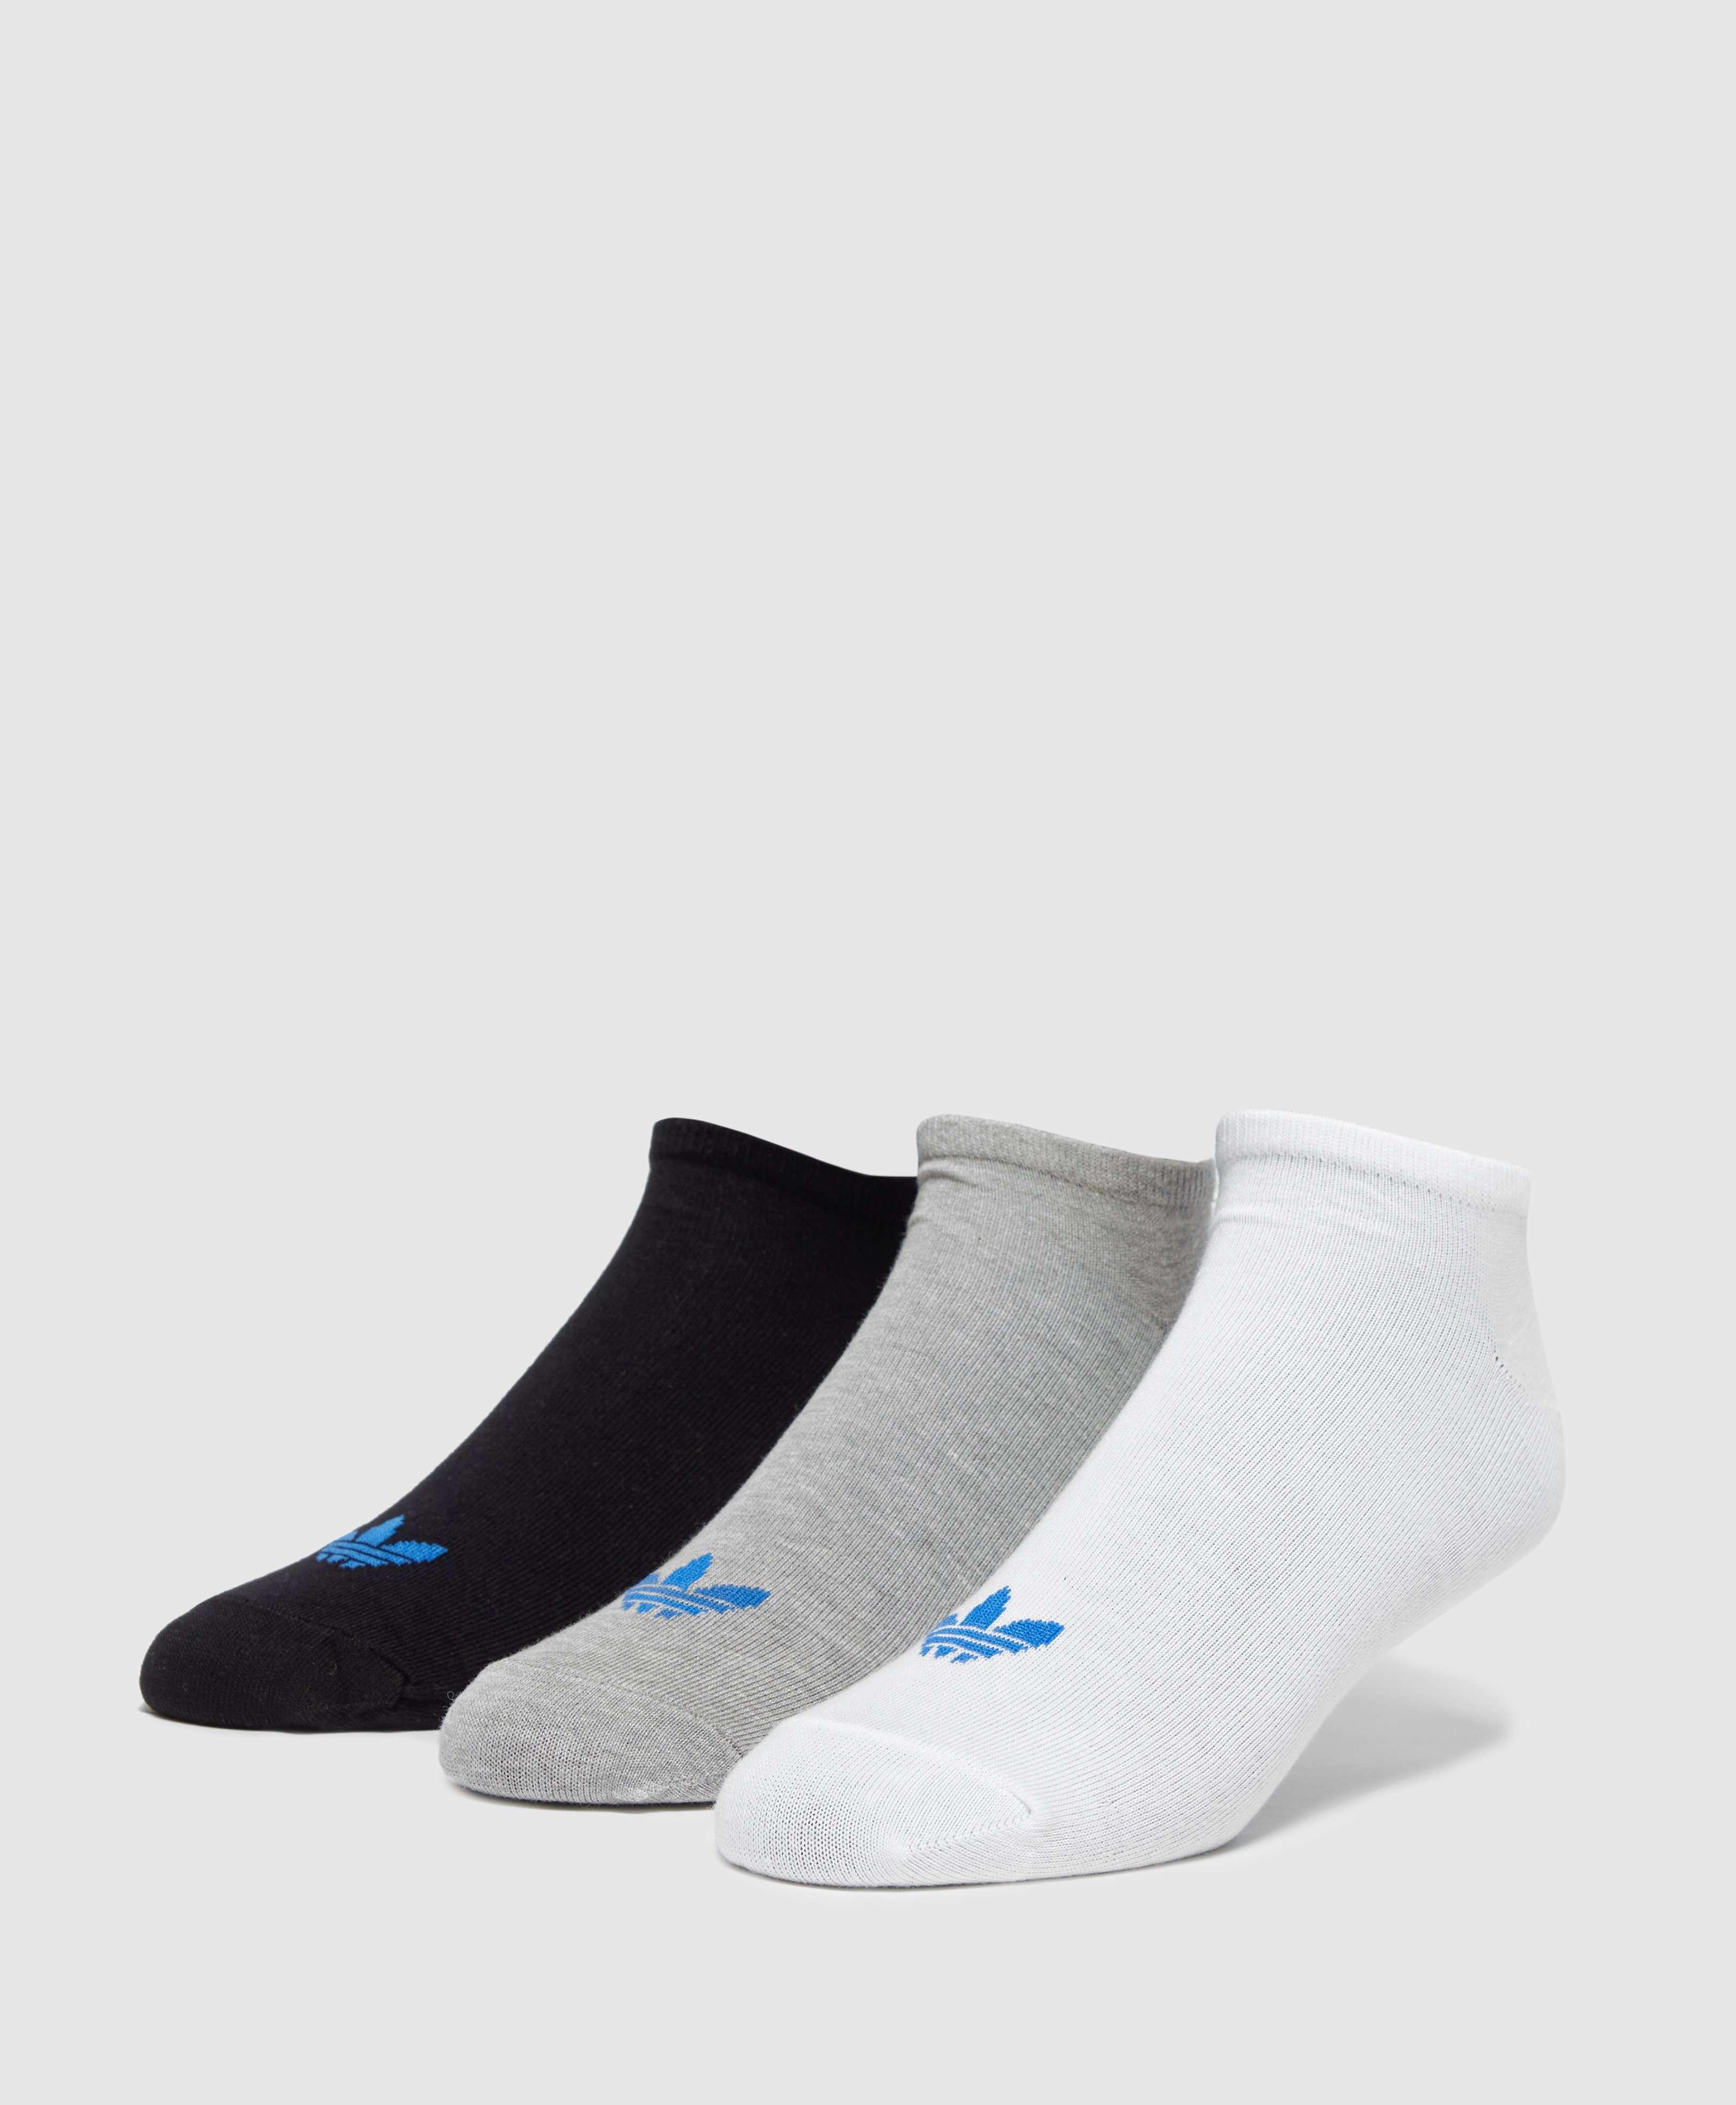 3 Pack Black Trefoil Liner Socks - Black adidas Originals